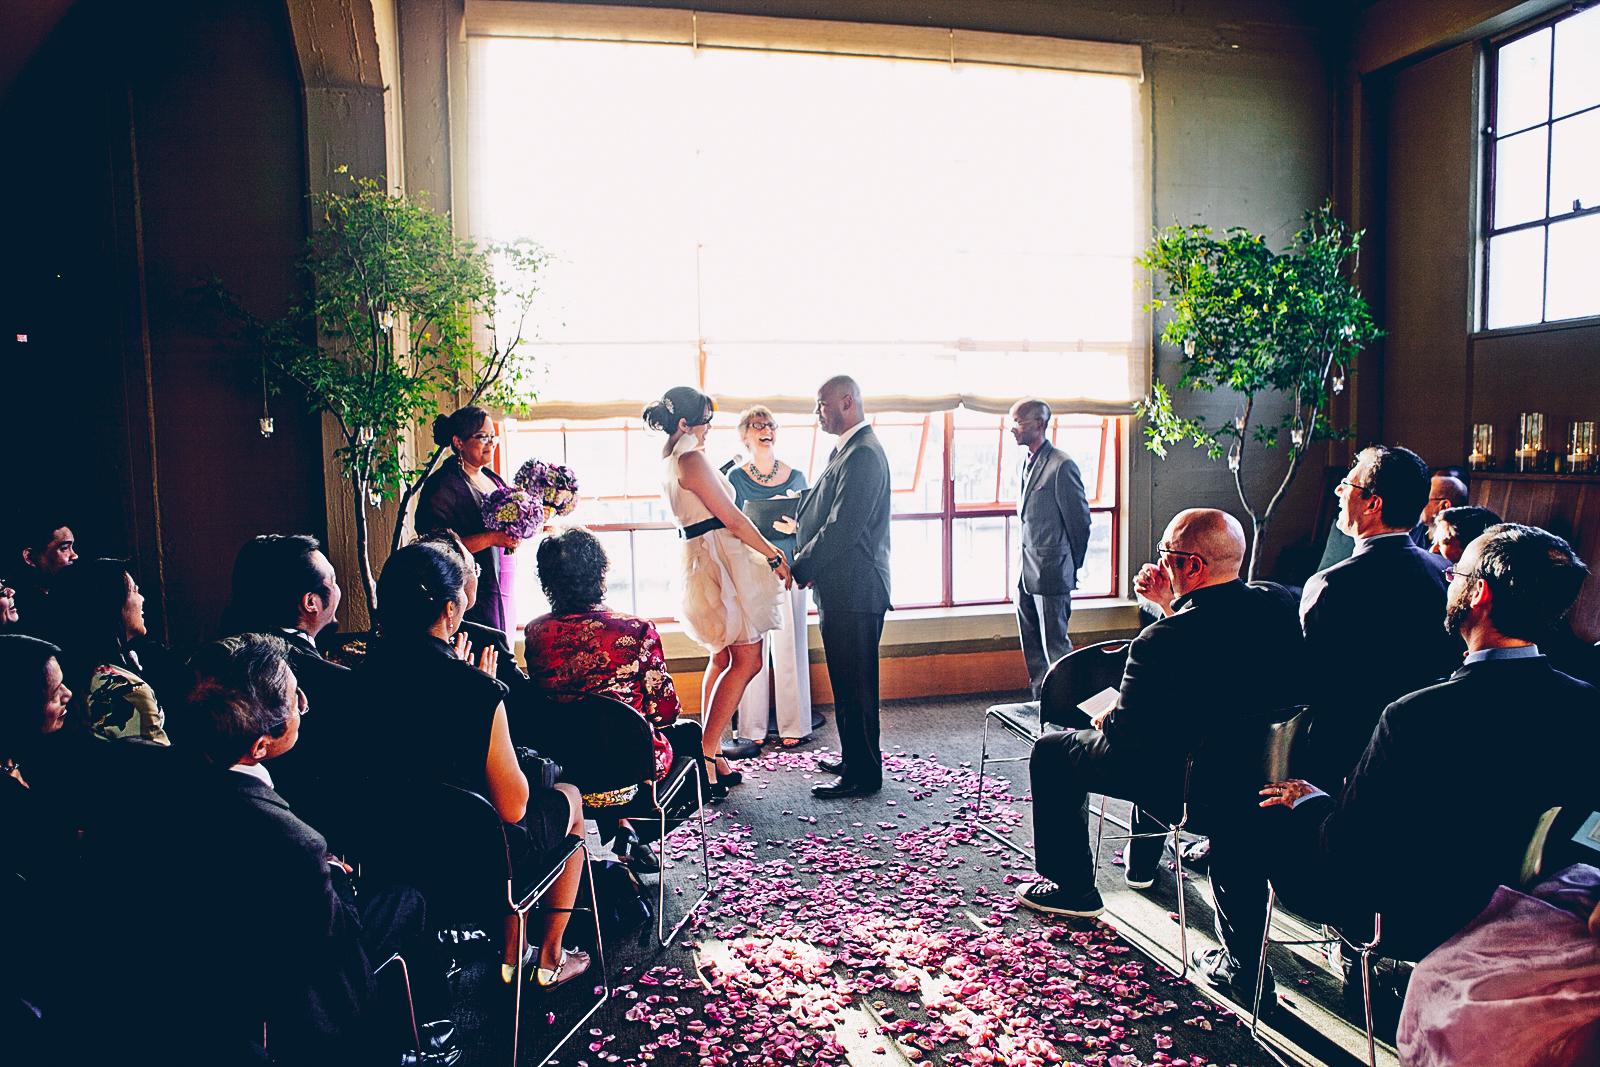 greens_restaurant_wedding_photography_san_franscisco_ebony_siovhan_bokeh_photography_52.jpg